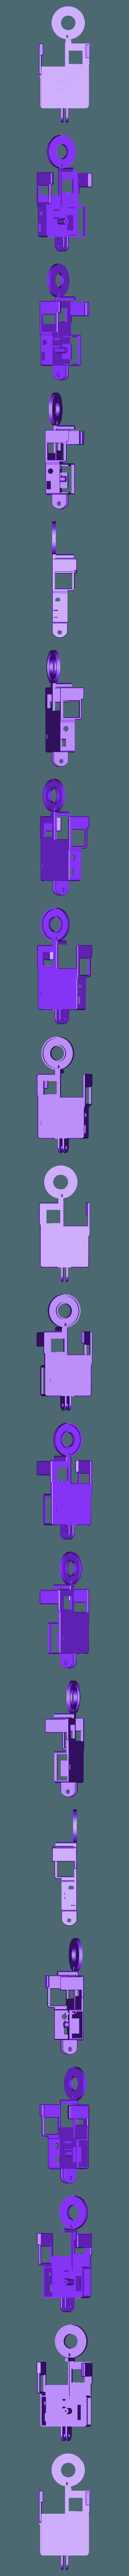 GoPro_Body.stl Download free STL file GoPro Hero 5 Light • 3D printable object, EricsDIY